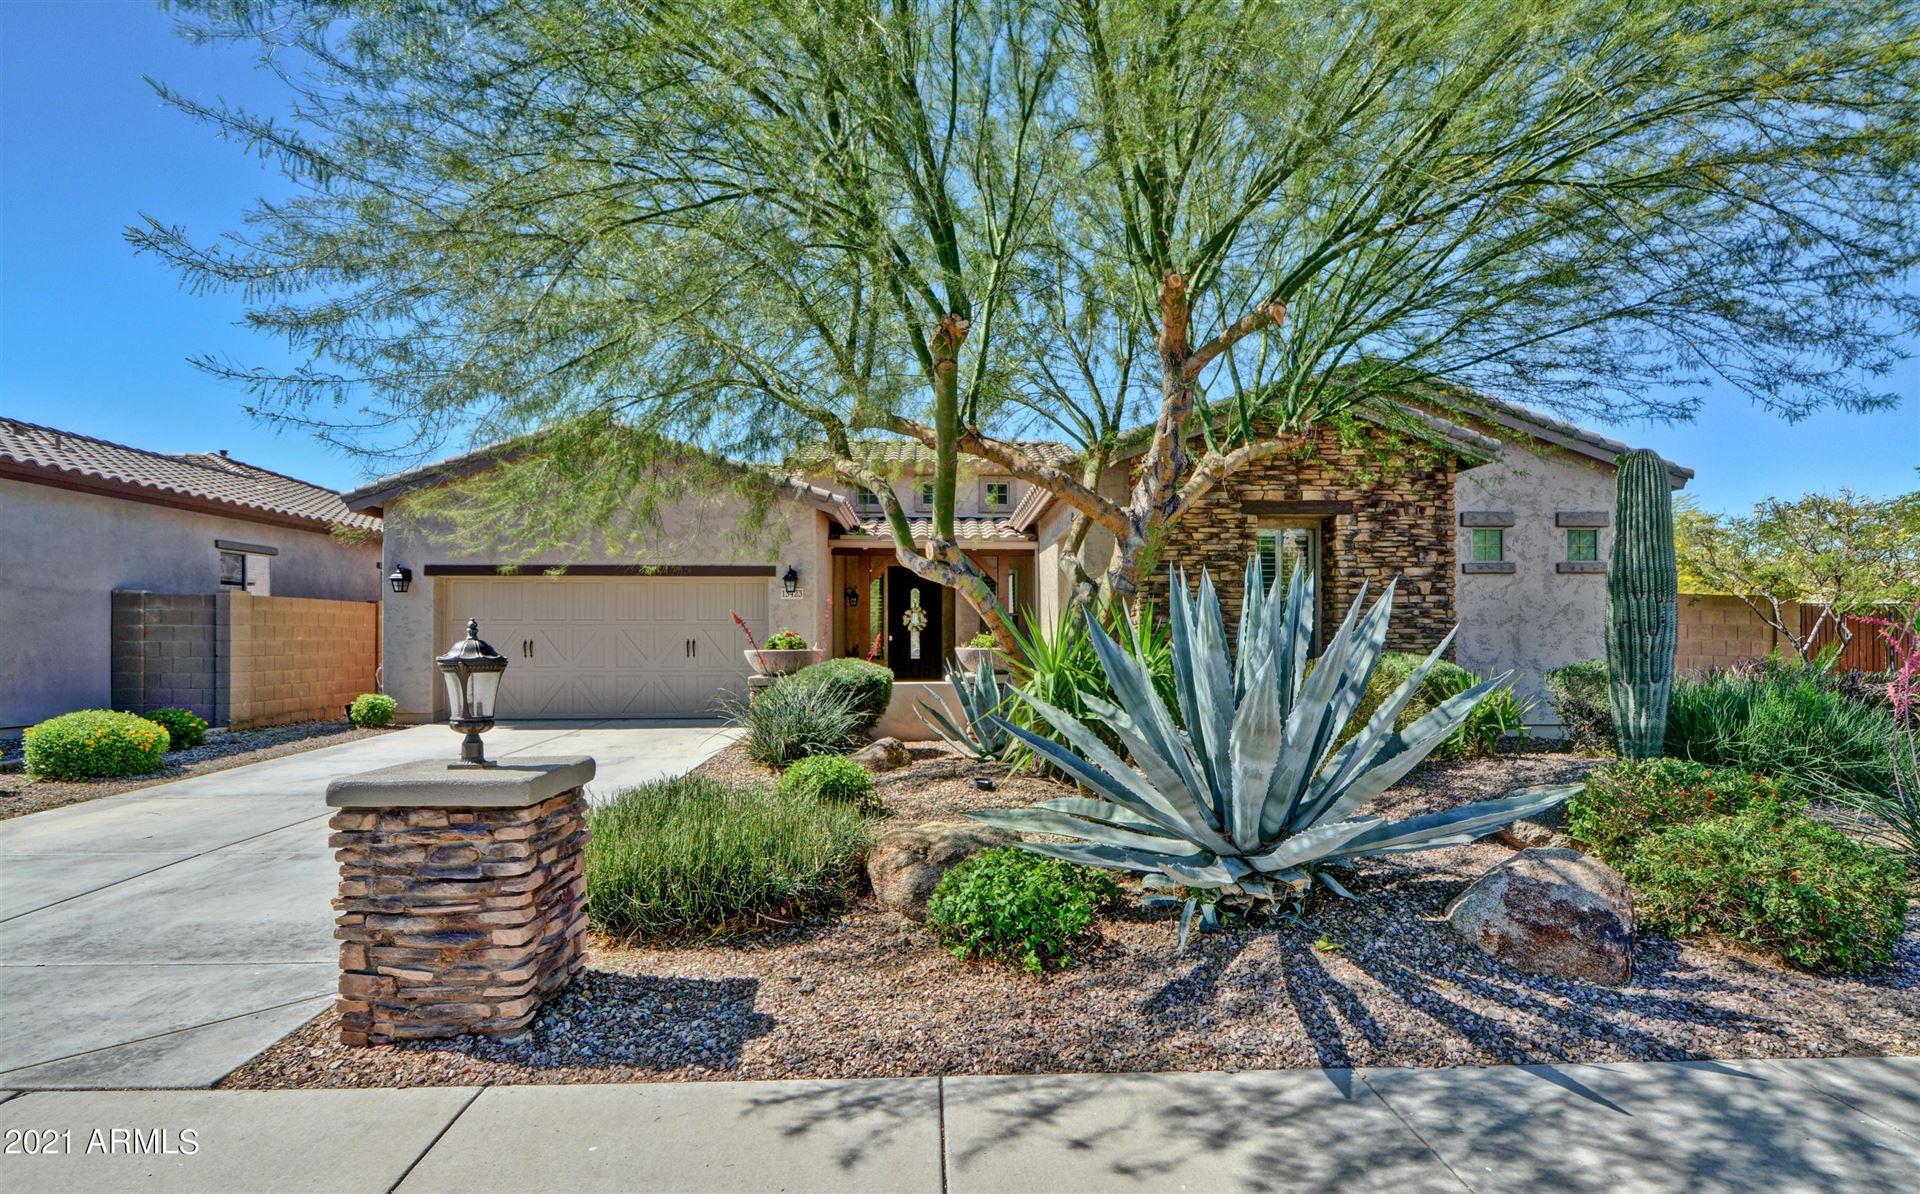 13423 W CHAPAROSA Way, Peoria, AZ 85383 - MLS#: 6227209